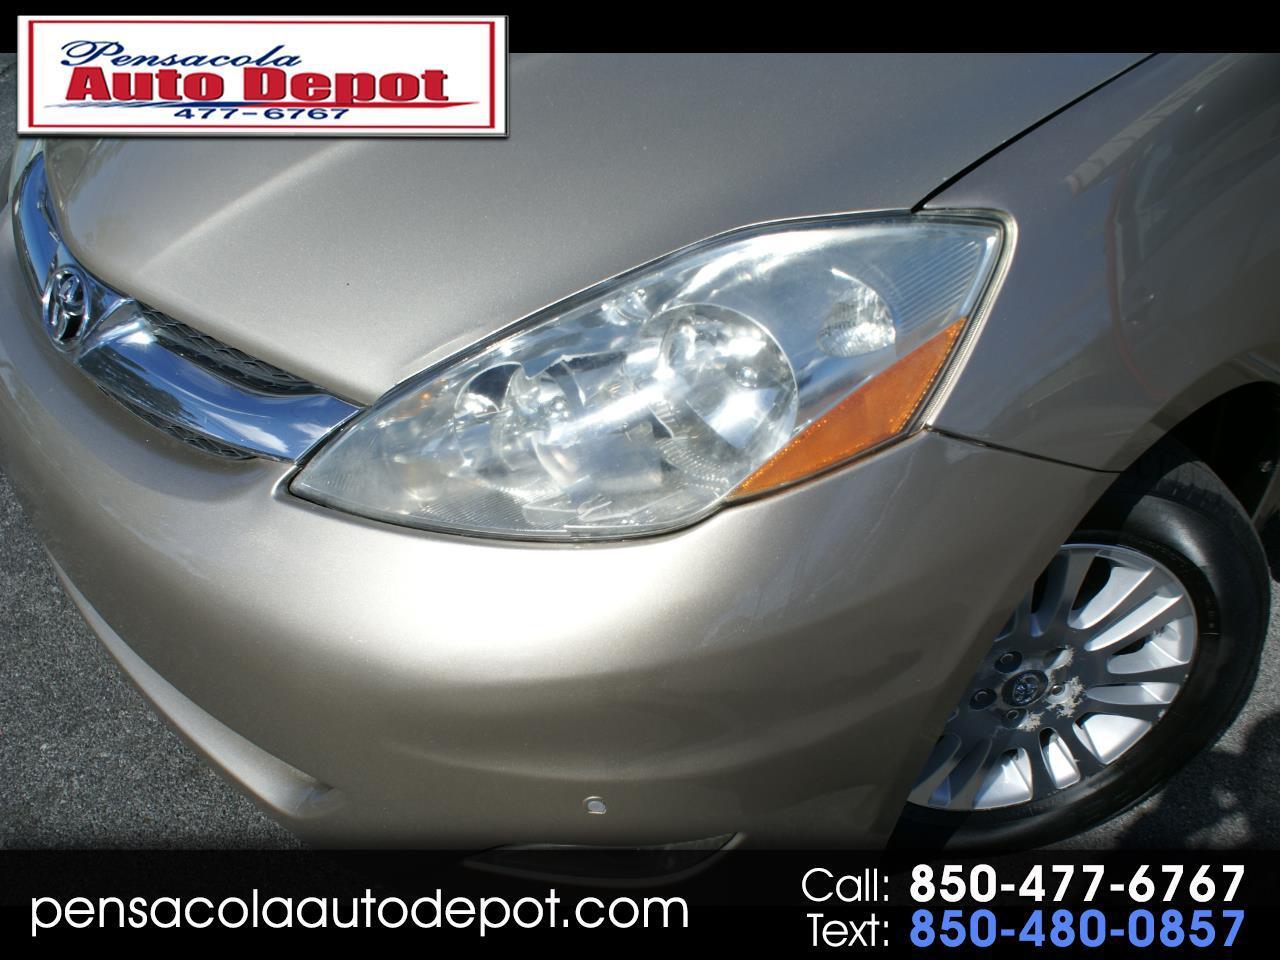 2008 Toyota Sienna XLE Limited AWD